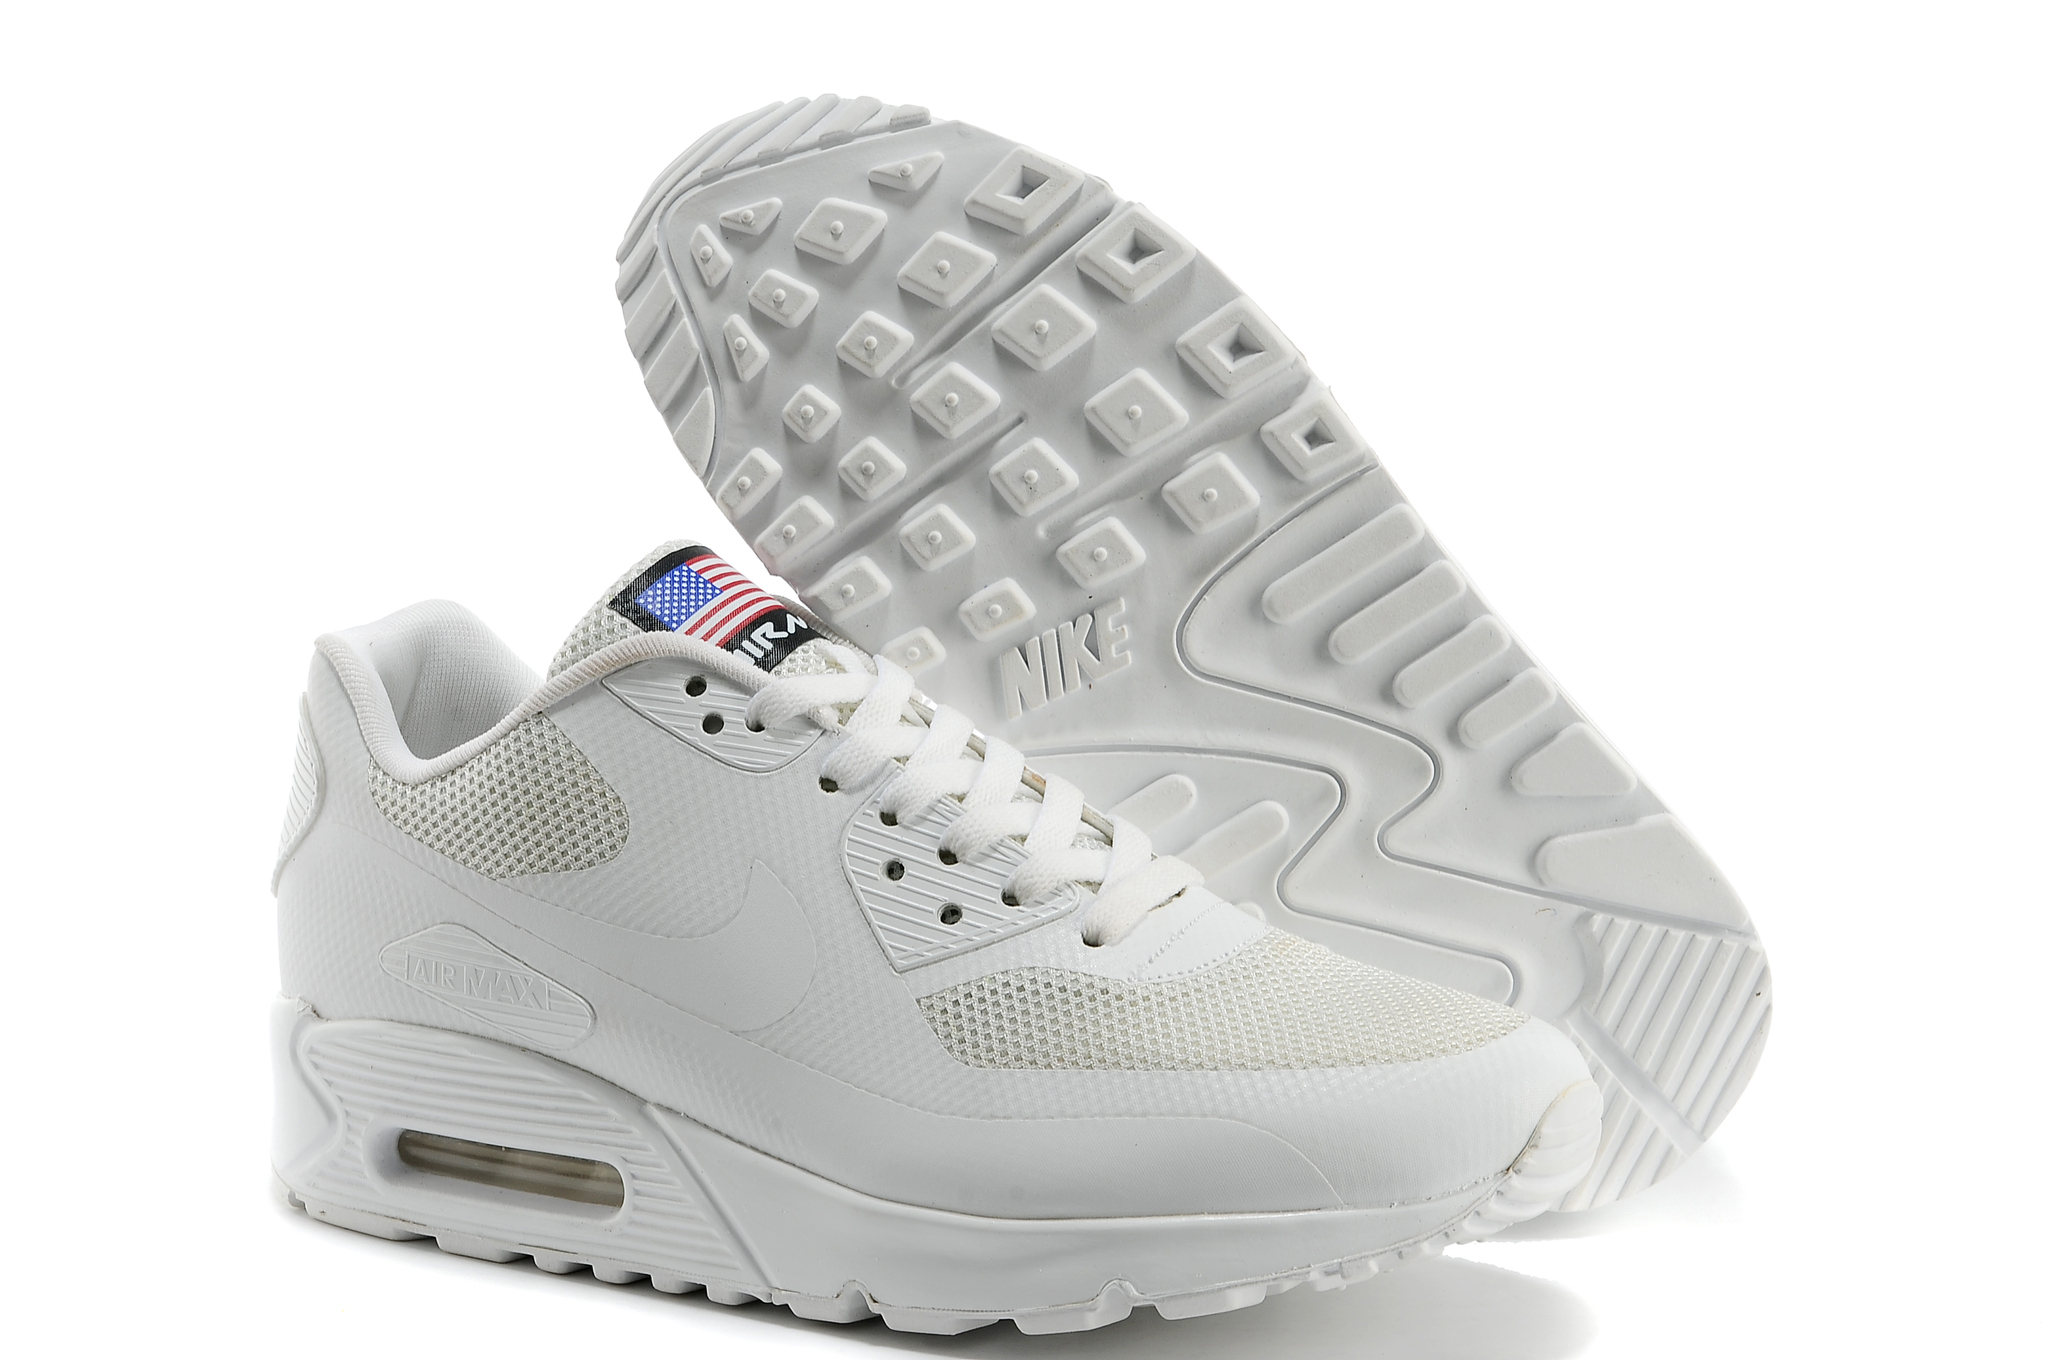 Nike_Air_Max_90_Hyperfuse_Independence_Day_White_Krossoffki.ru.jpg